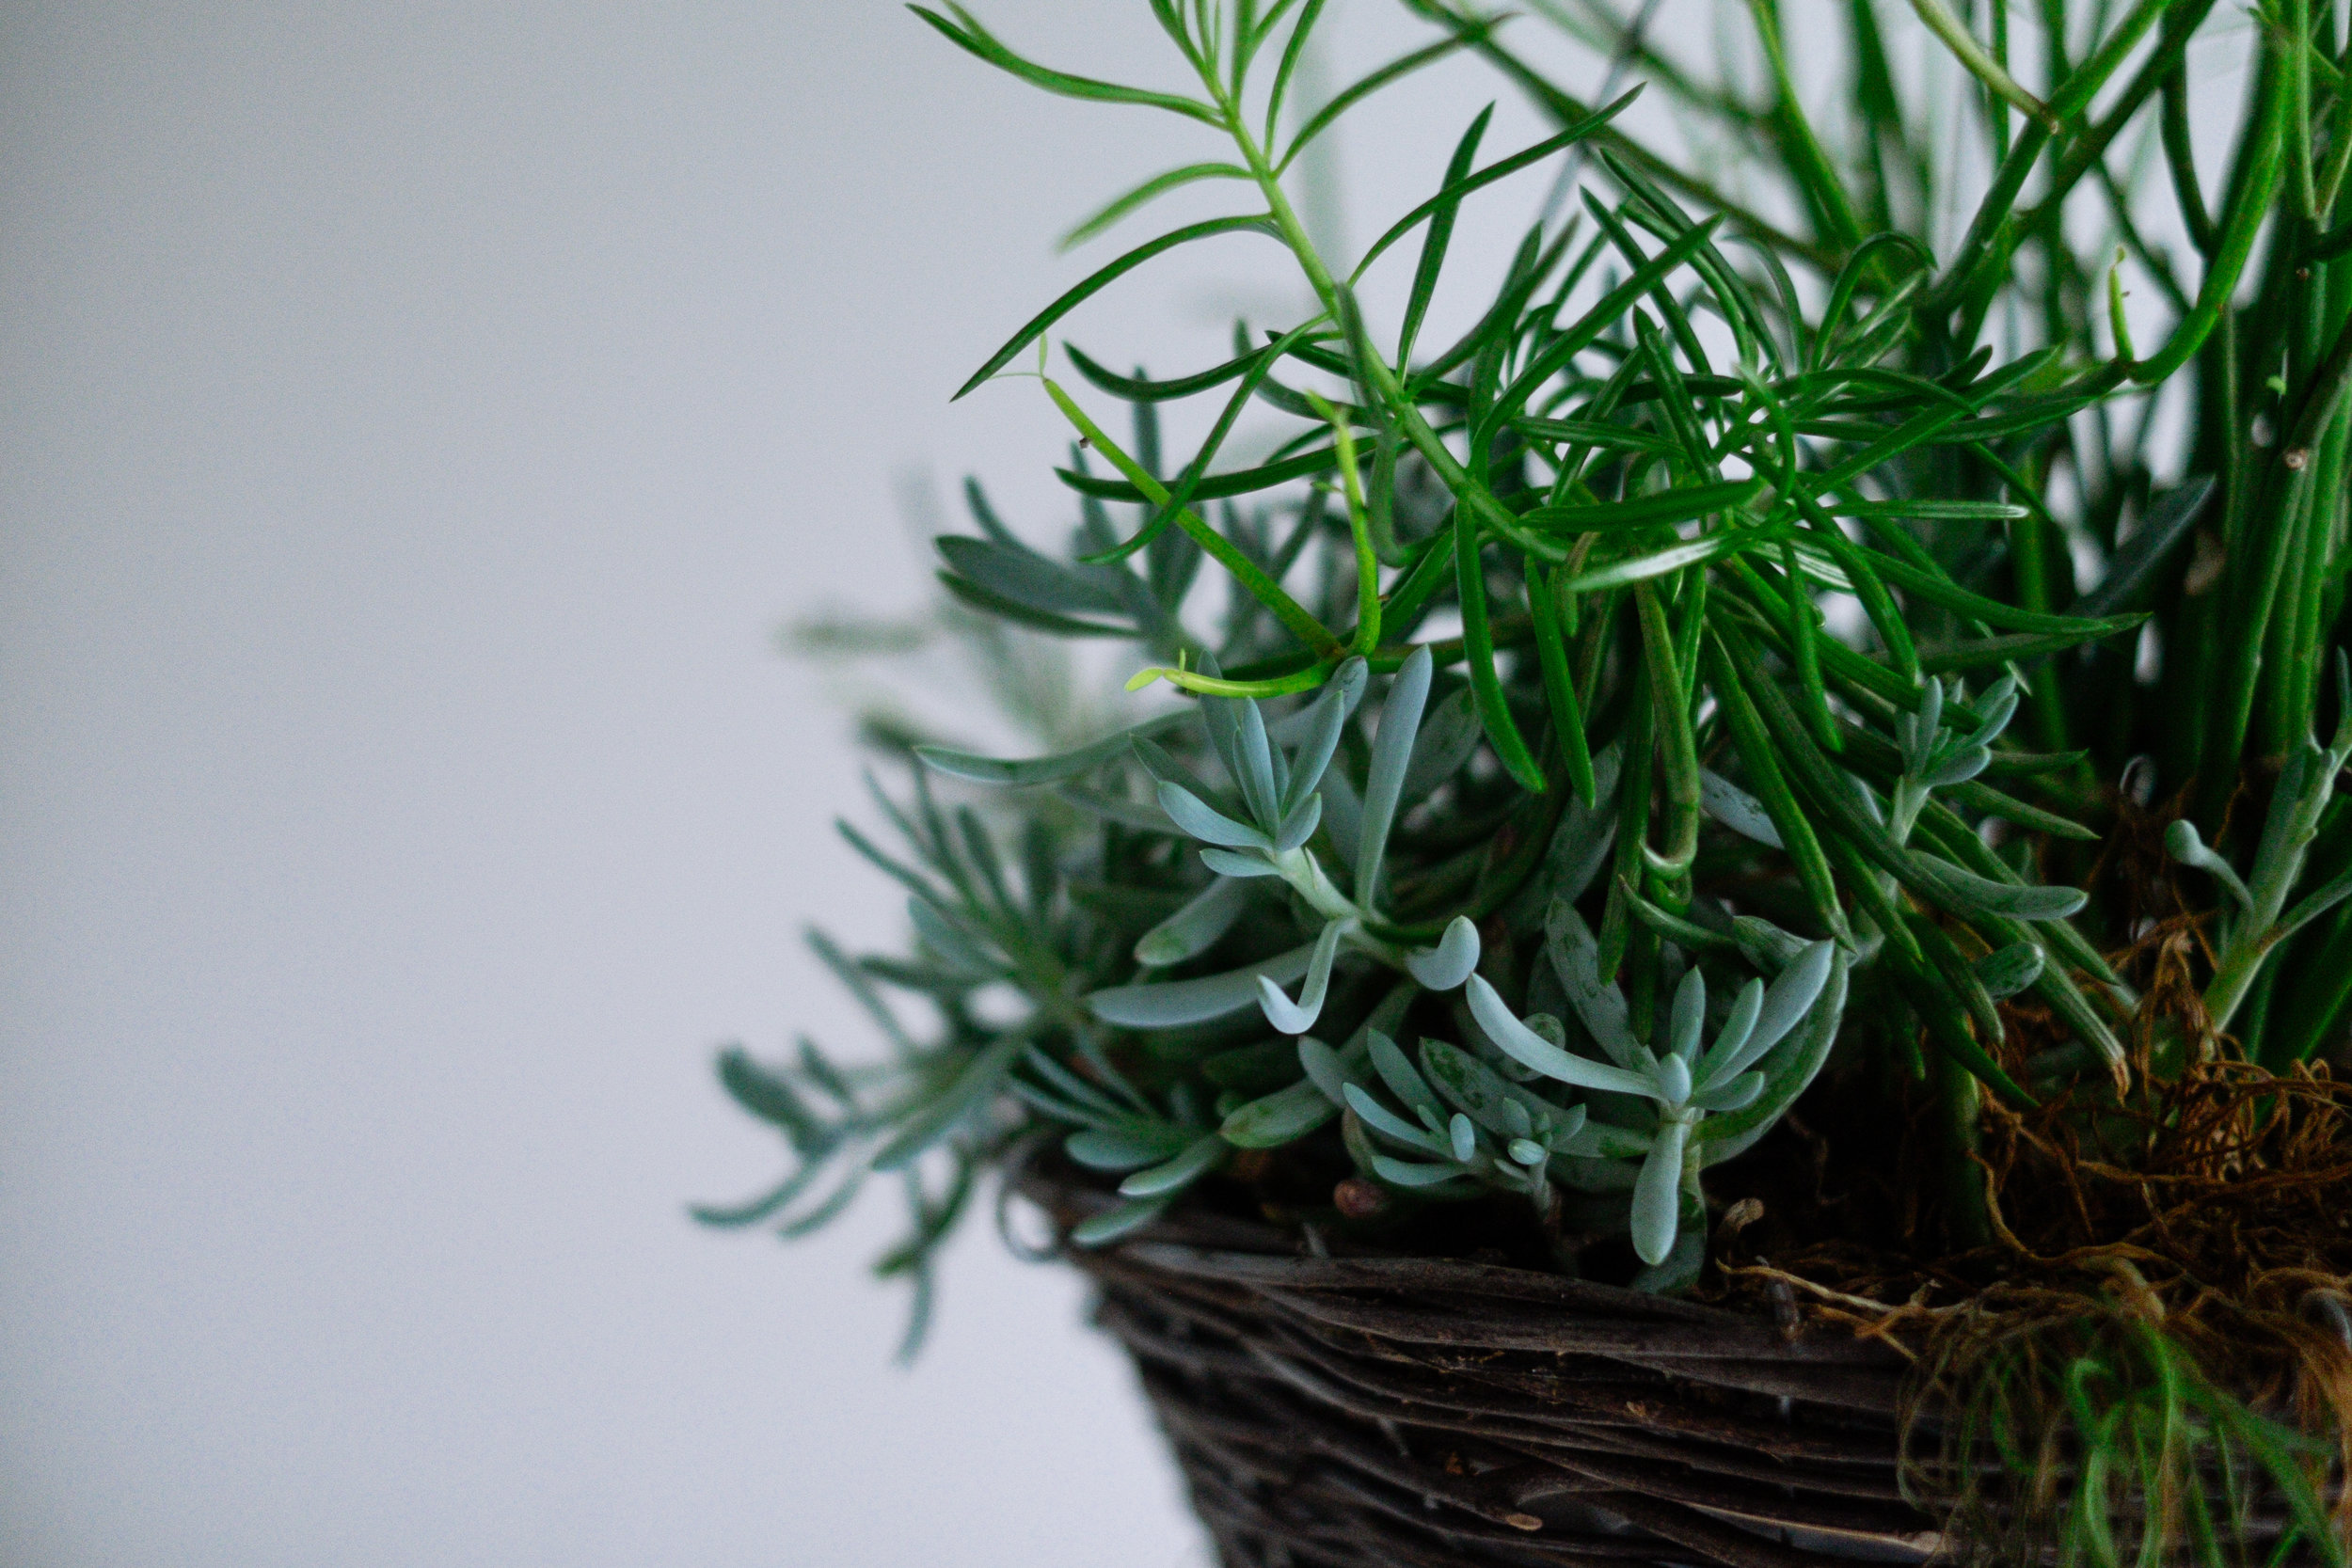 Hanging Plants - Garden Maintenance